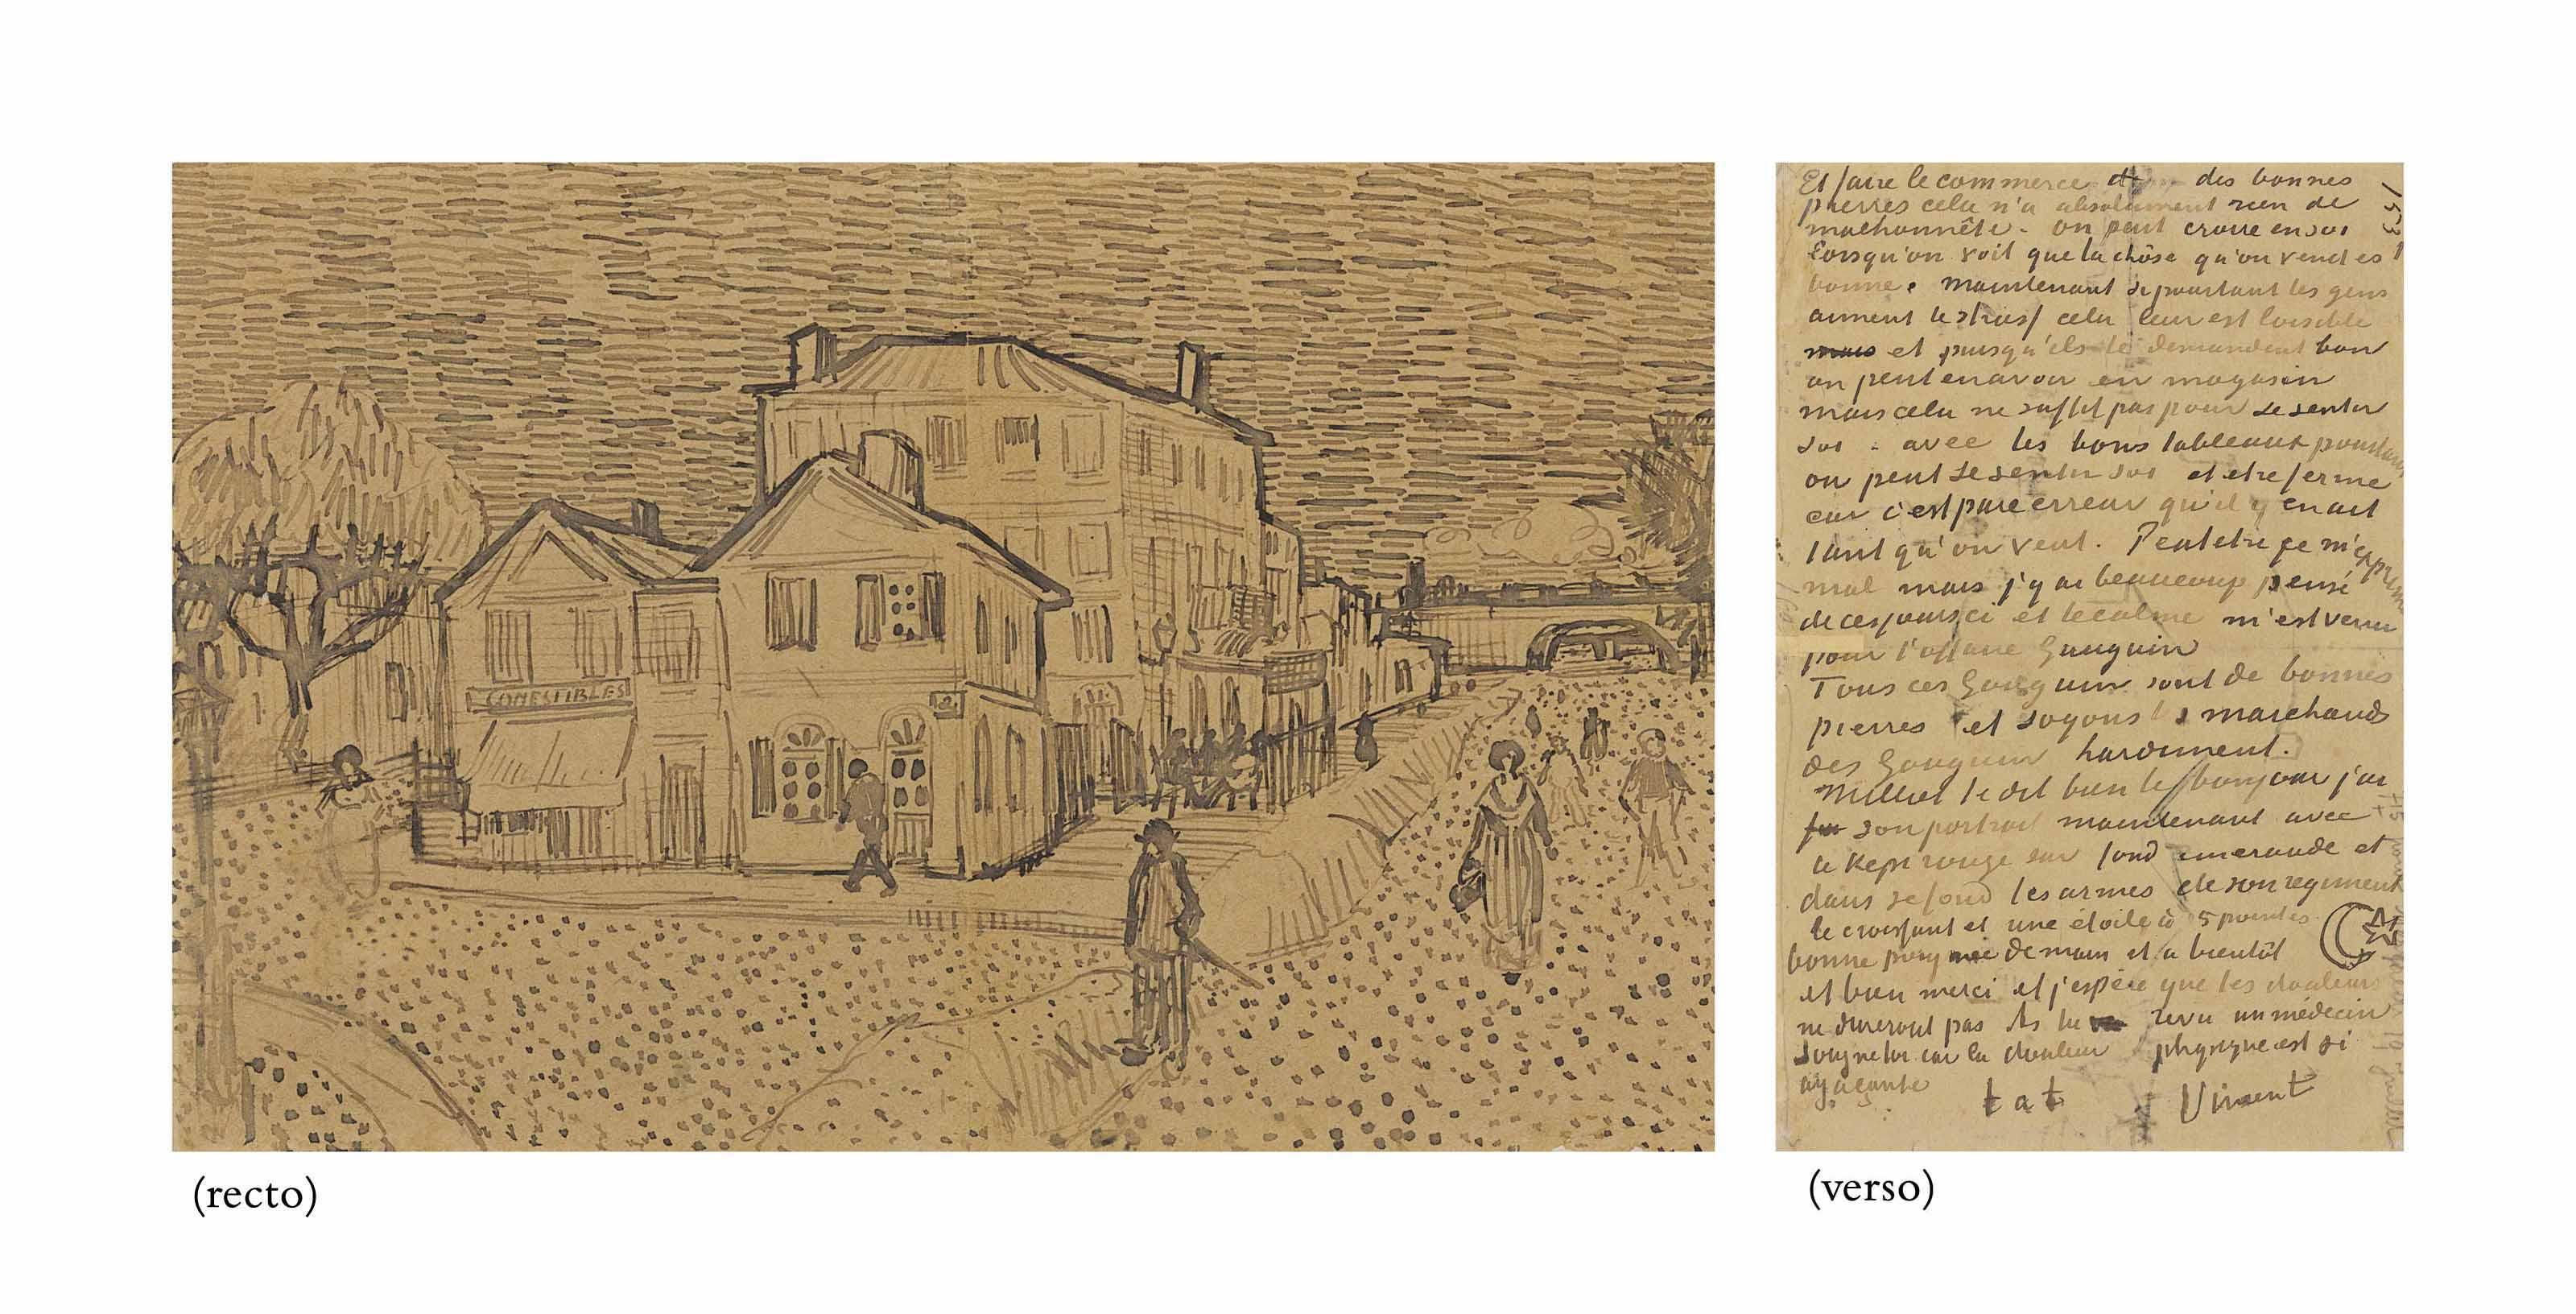 De Haute Qualite Vincent Van Gogh (1853 1890)